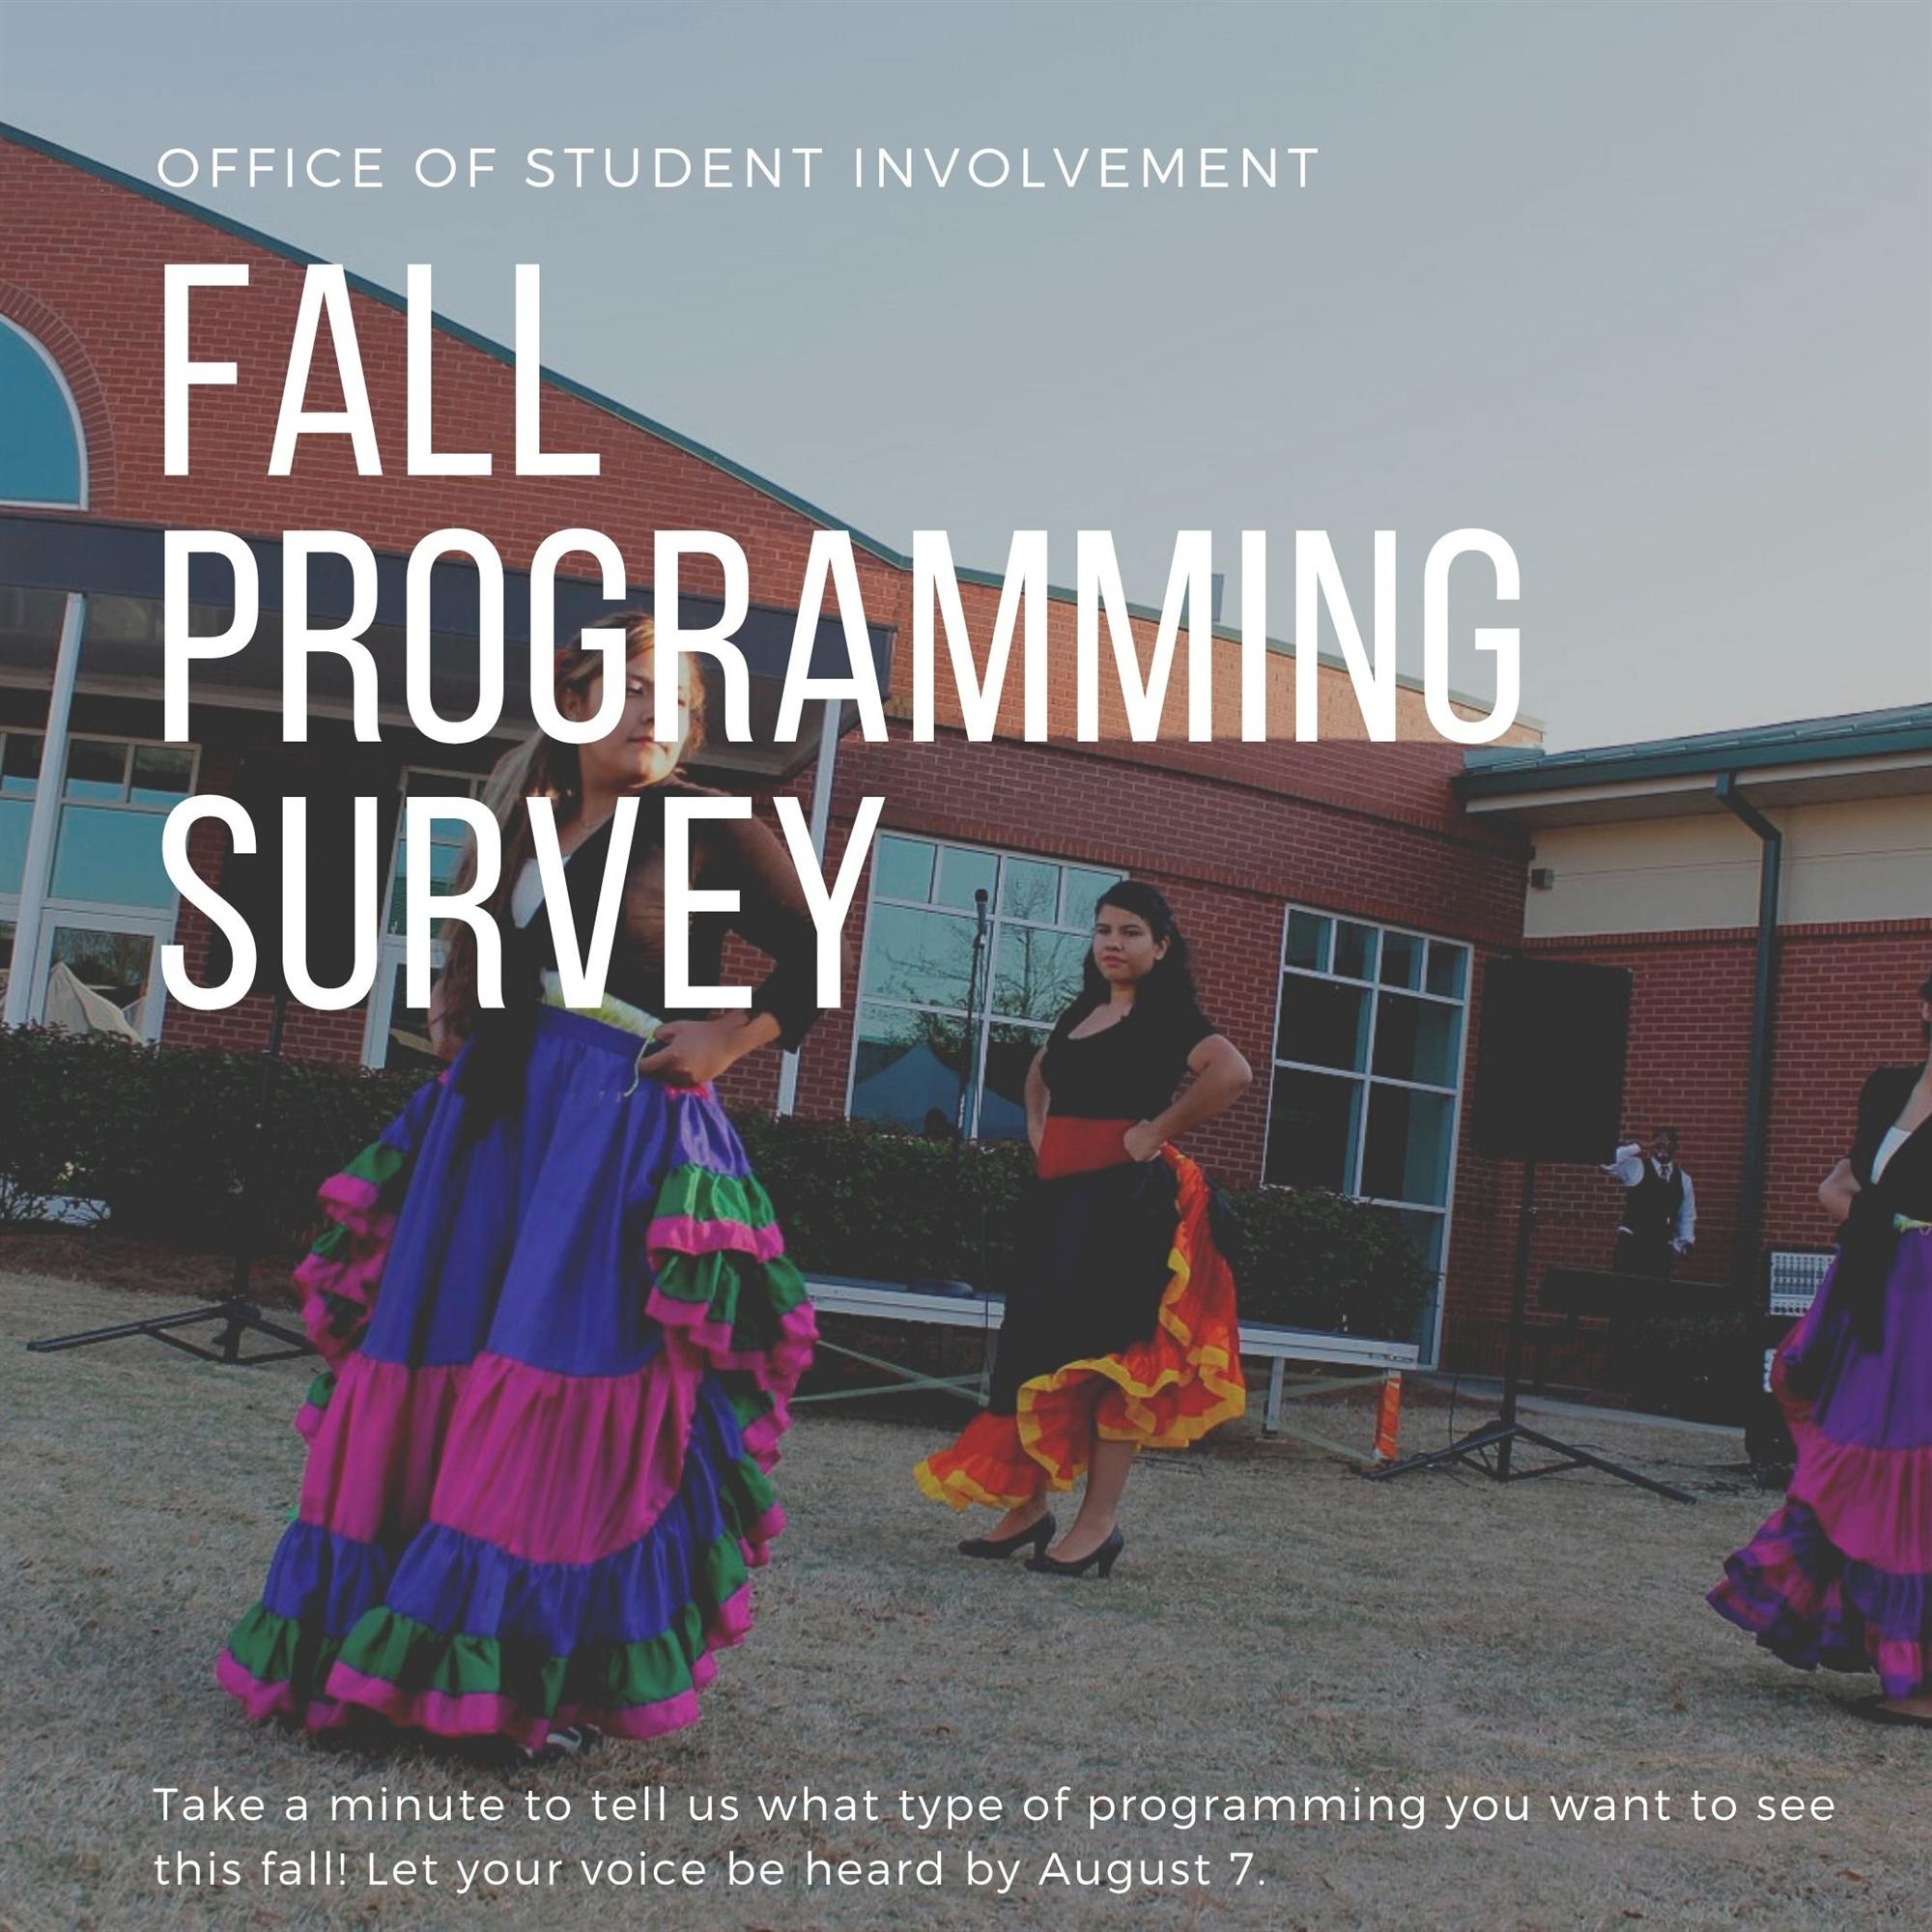 Fall Programming Survey